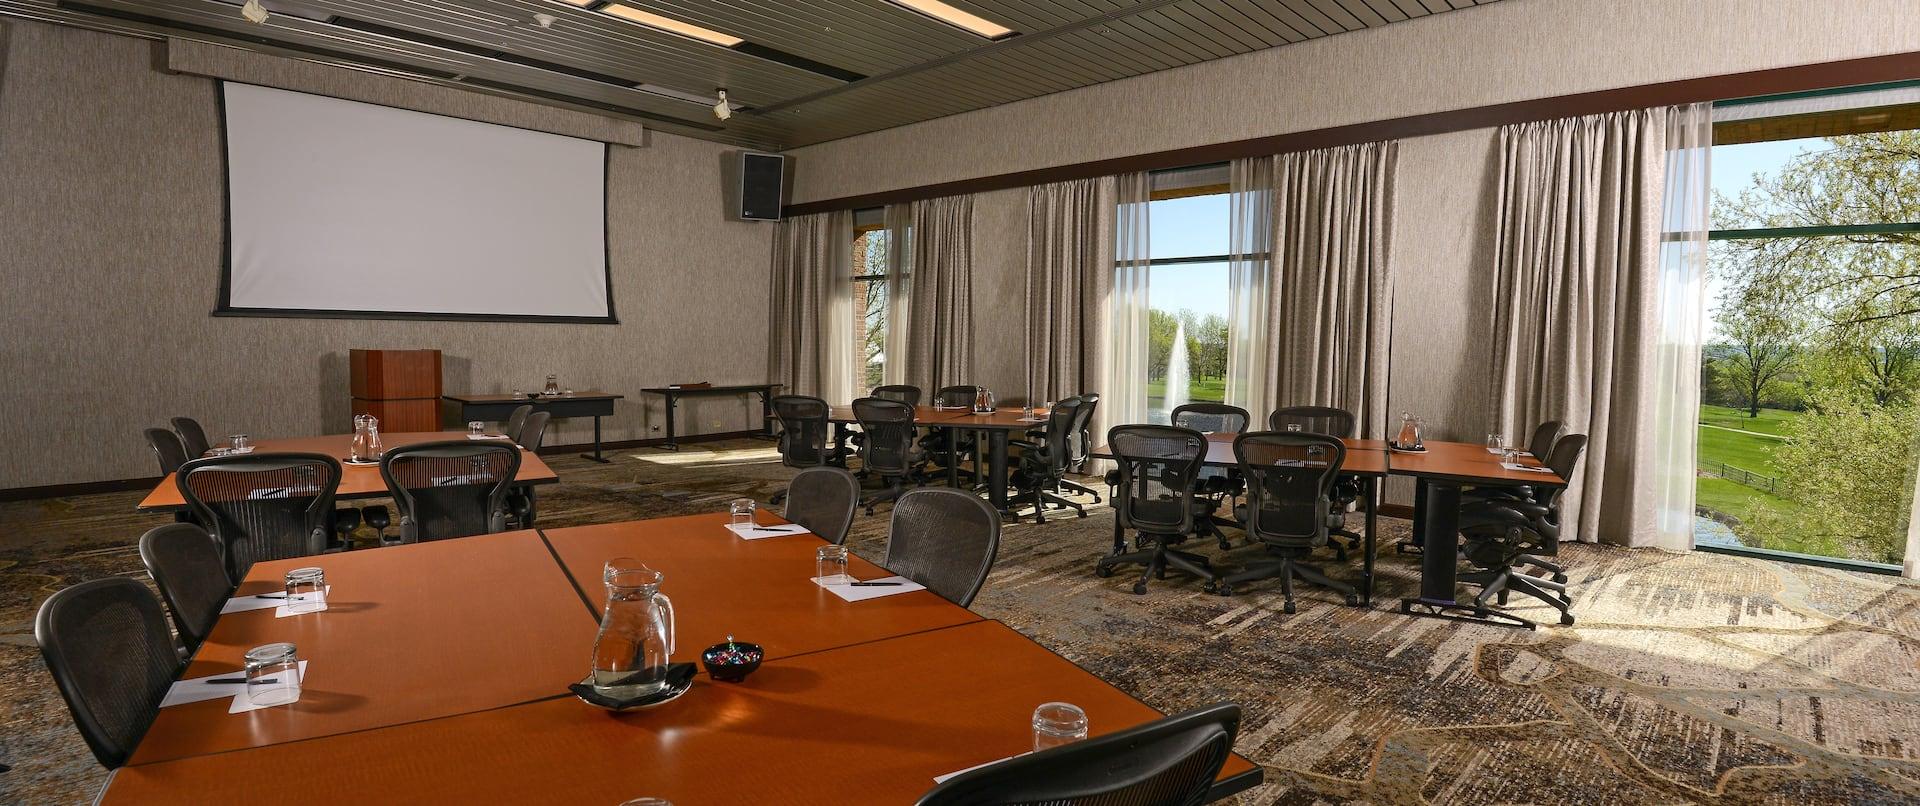 Conference Room Clusters Setup